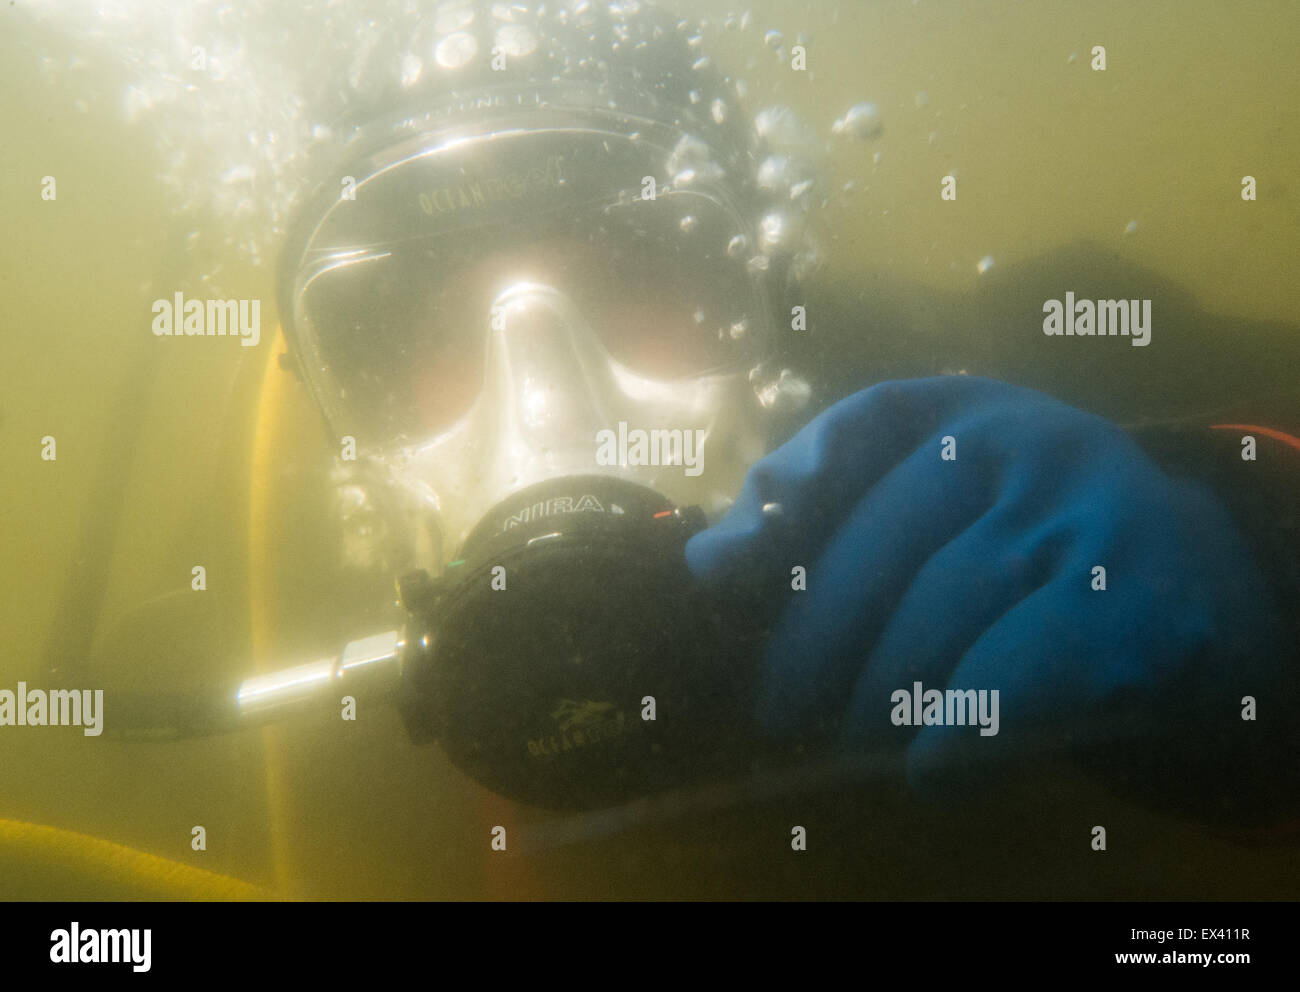 Diver Heiko Eisenhauer of surface water rescue association SEG Wasserrettung Flaeming-Spreewald e.V. of the German - Stock Image